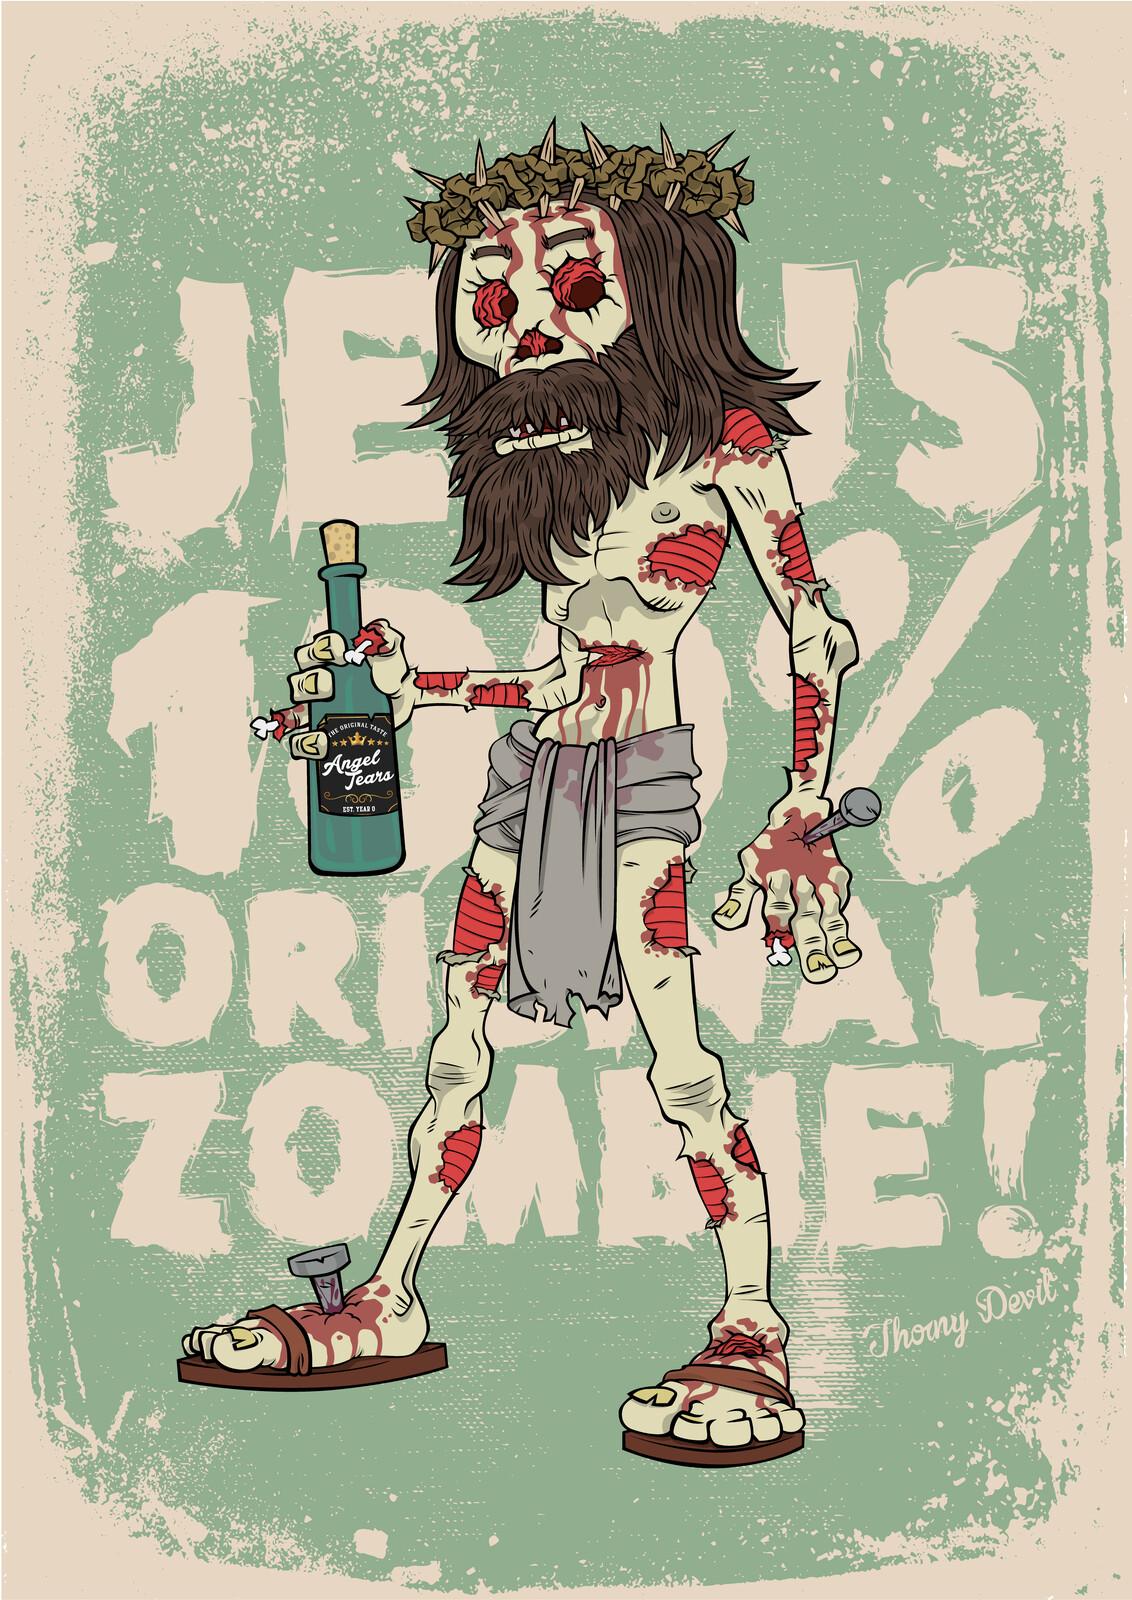 100% Original Zombie poster